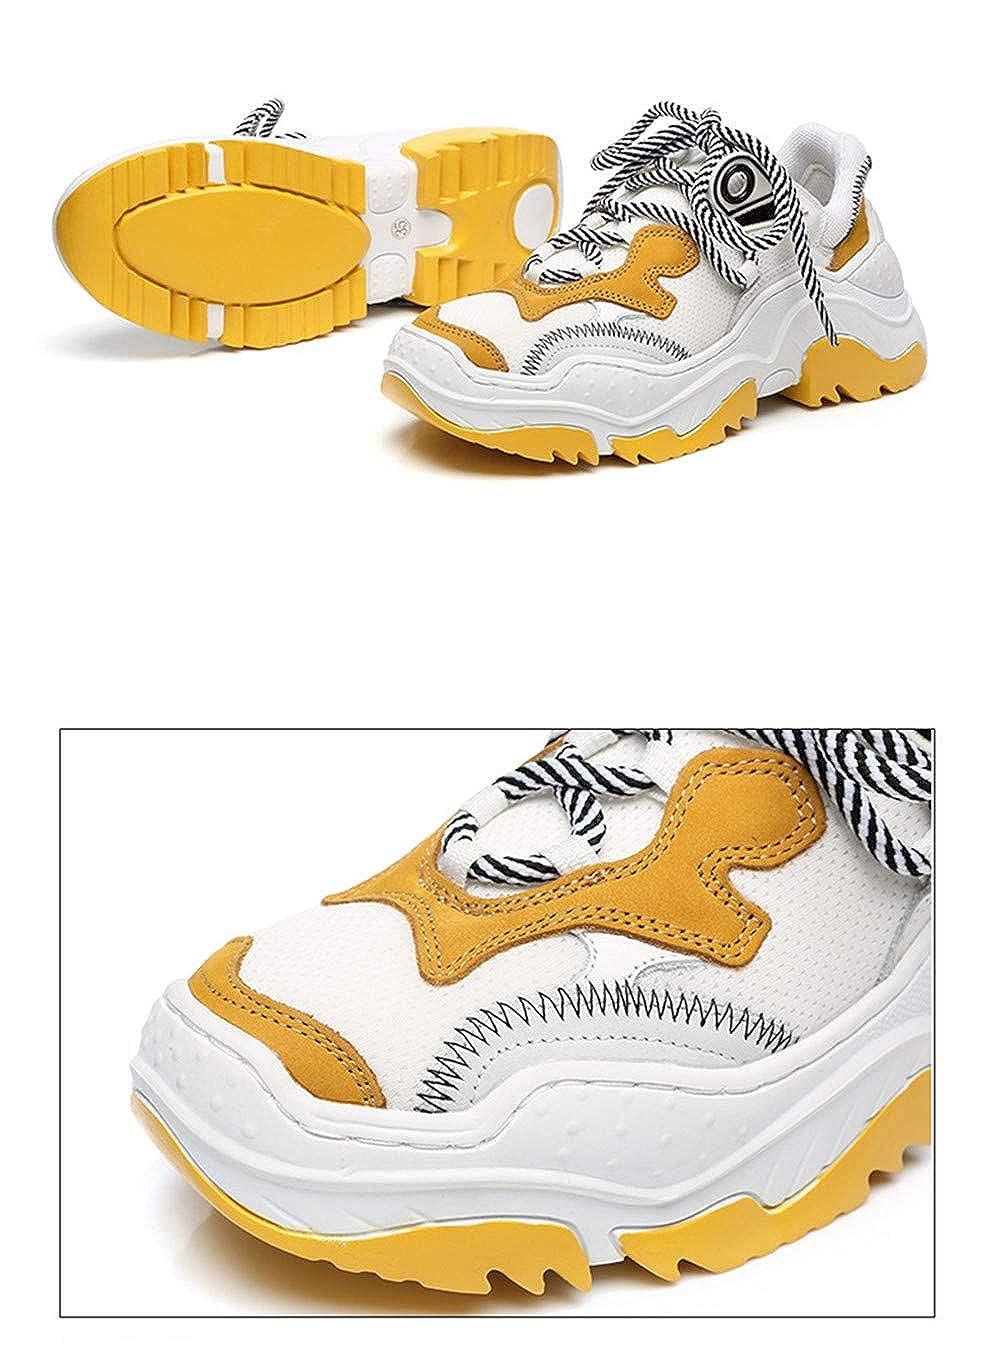 somethingoods Women Lace Up Platform Heels Sneakers Casual Shoes Increase Height Ladies Sneakers